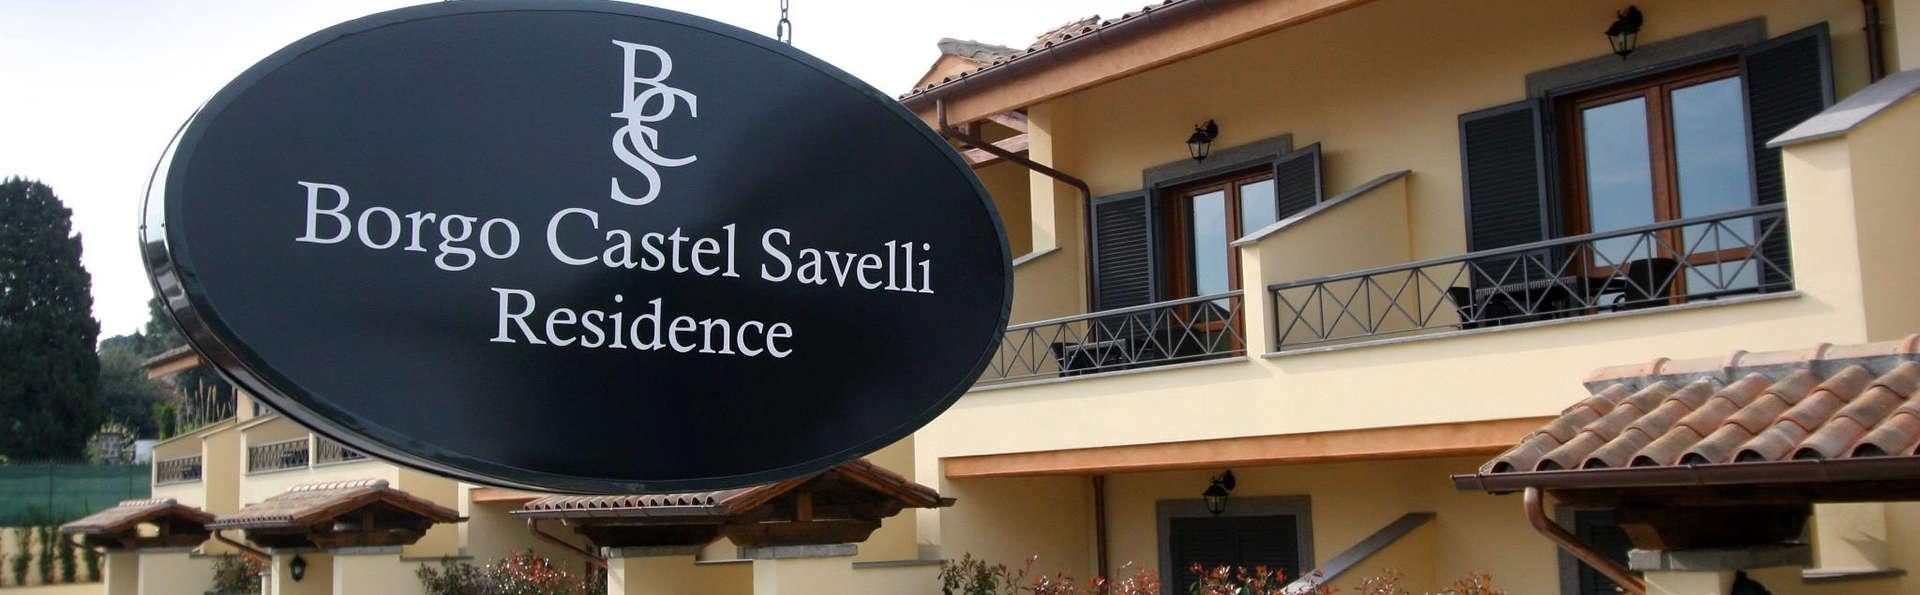 Borgo Castel Savelli - Edit_Front4.jpg